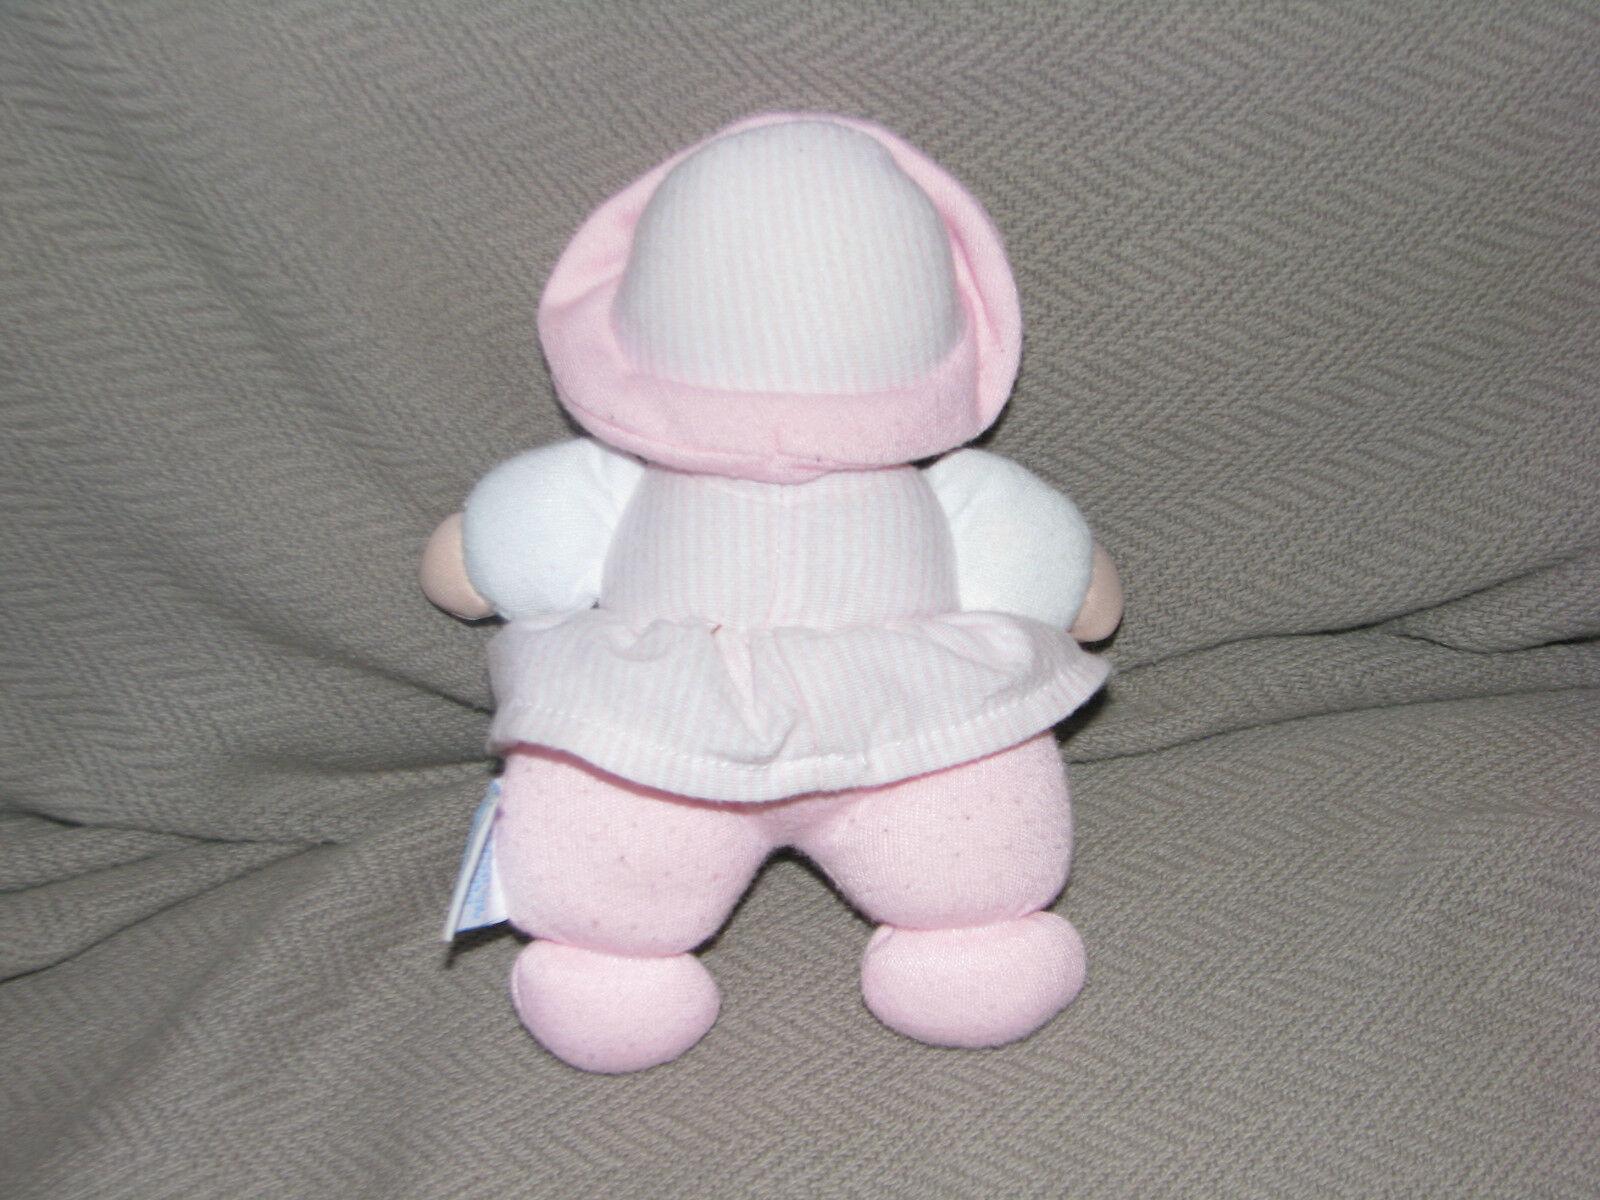 EDEN STUFFED PLUSH CLOTH BABY GIRL DOLL RATTLE HEART TERRY WHITE PINK POLKA DOT